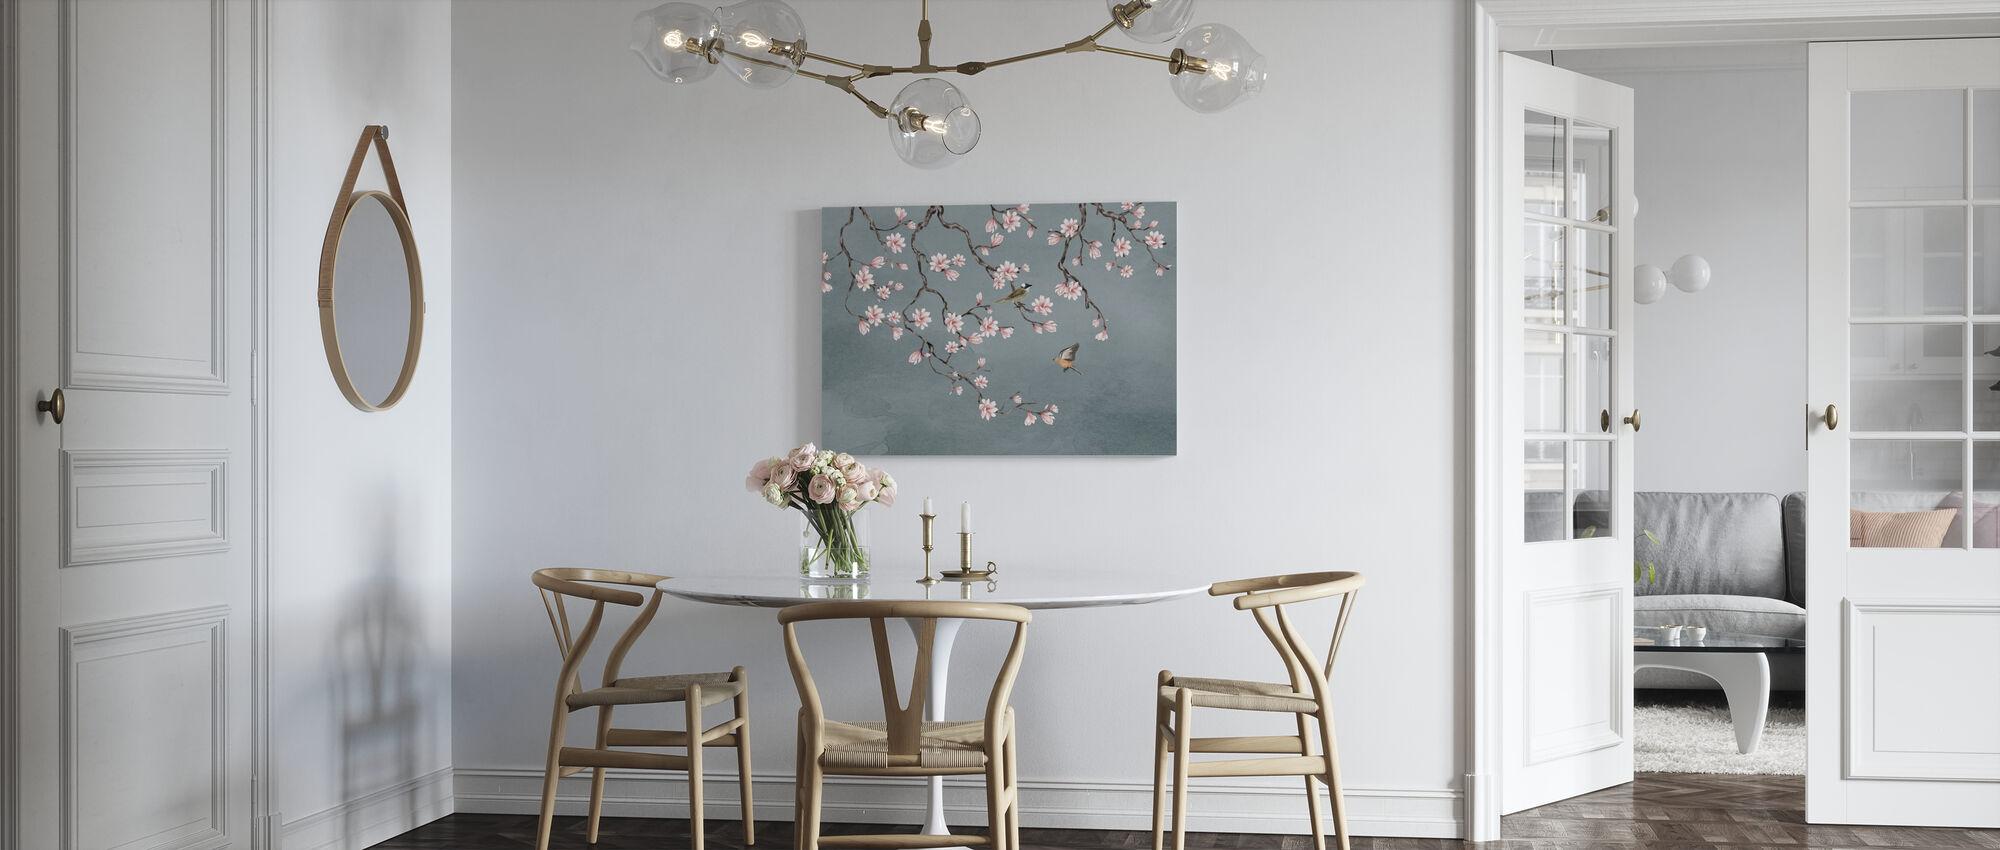 Birds Meeting Place - Canvas print - Kitchen